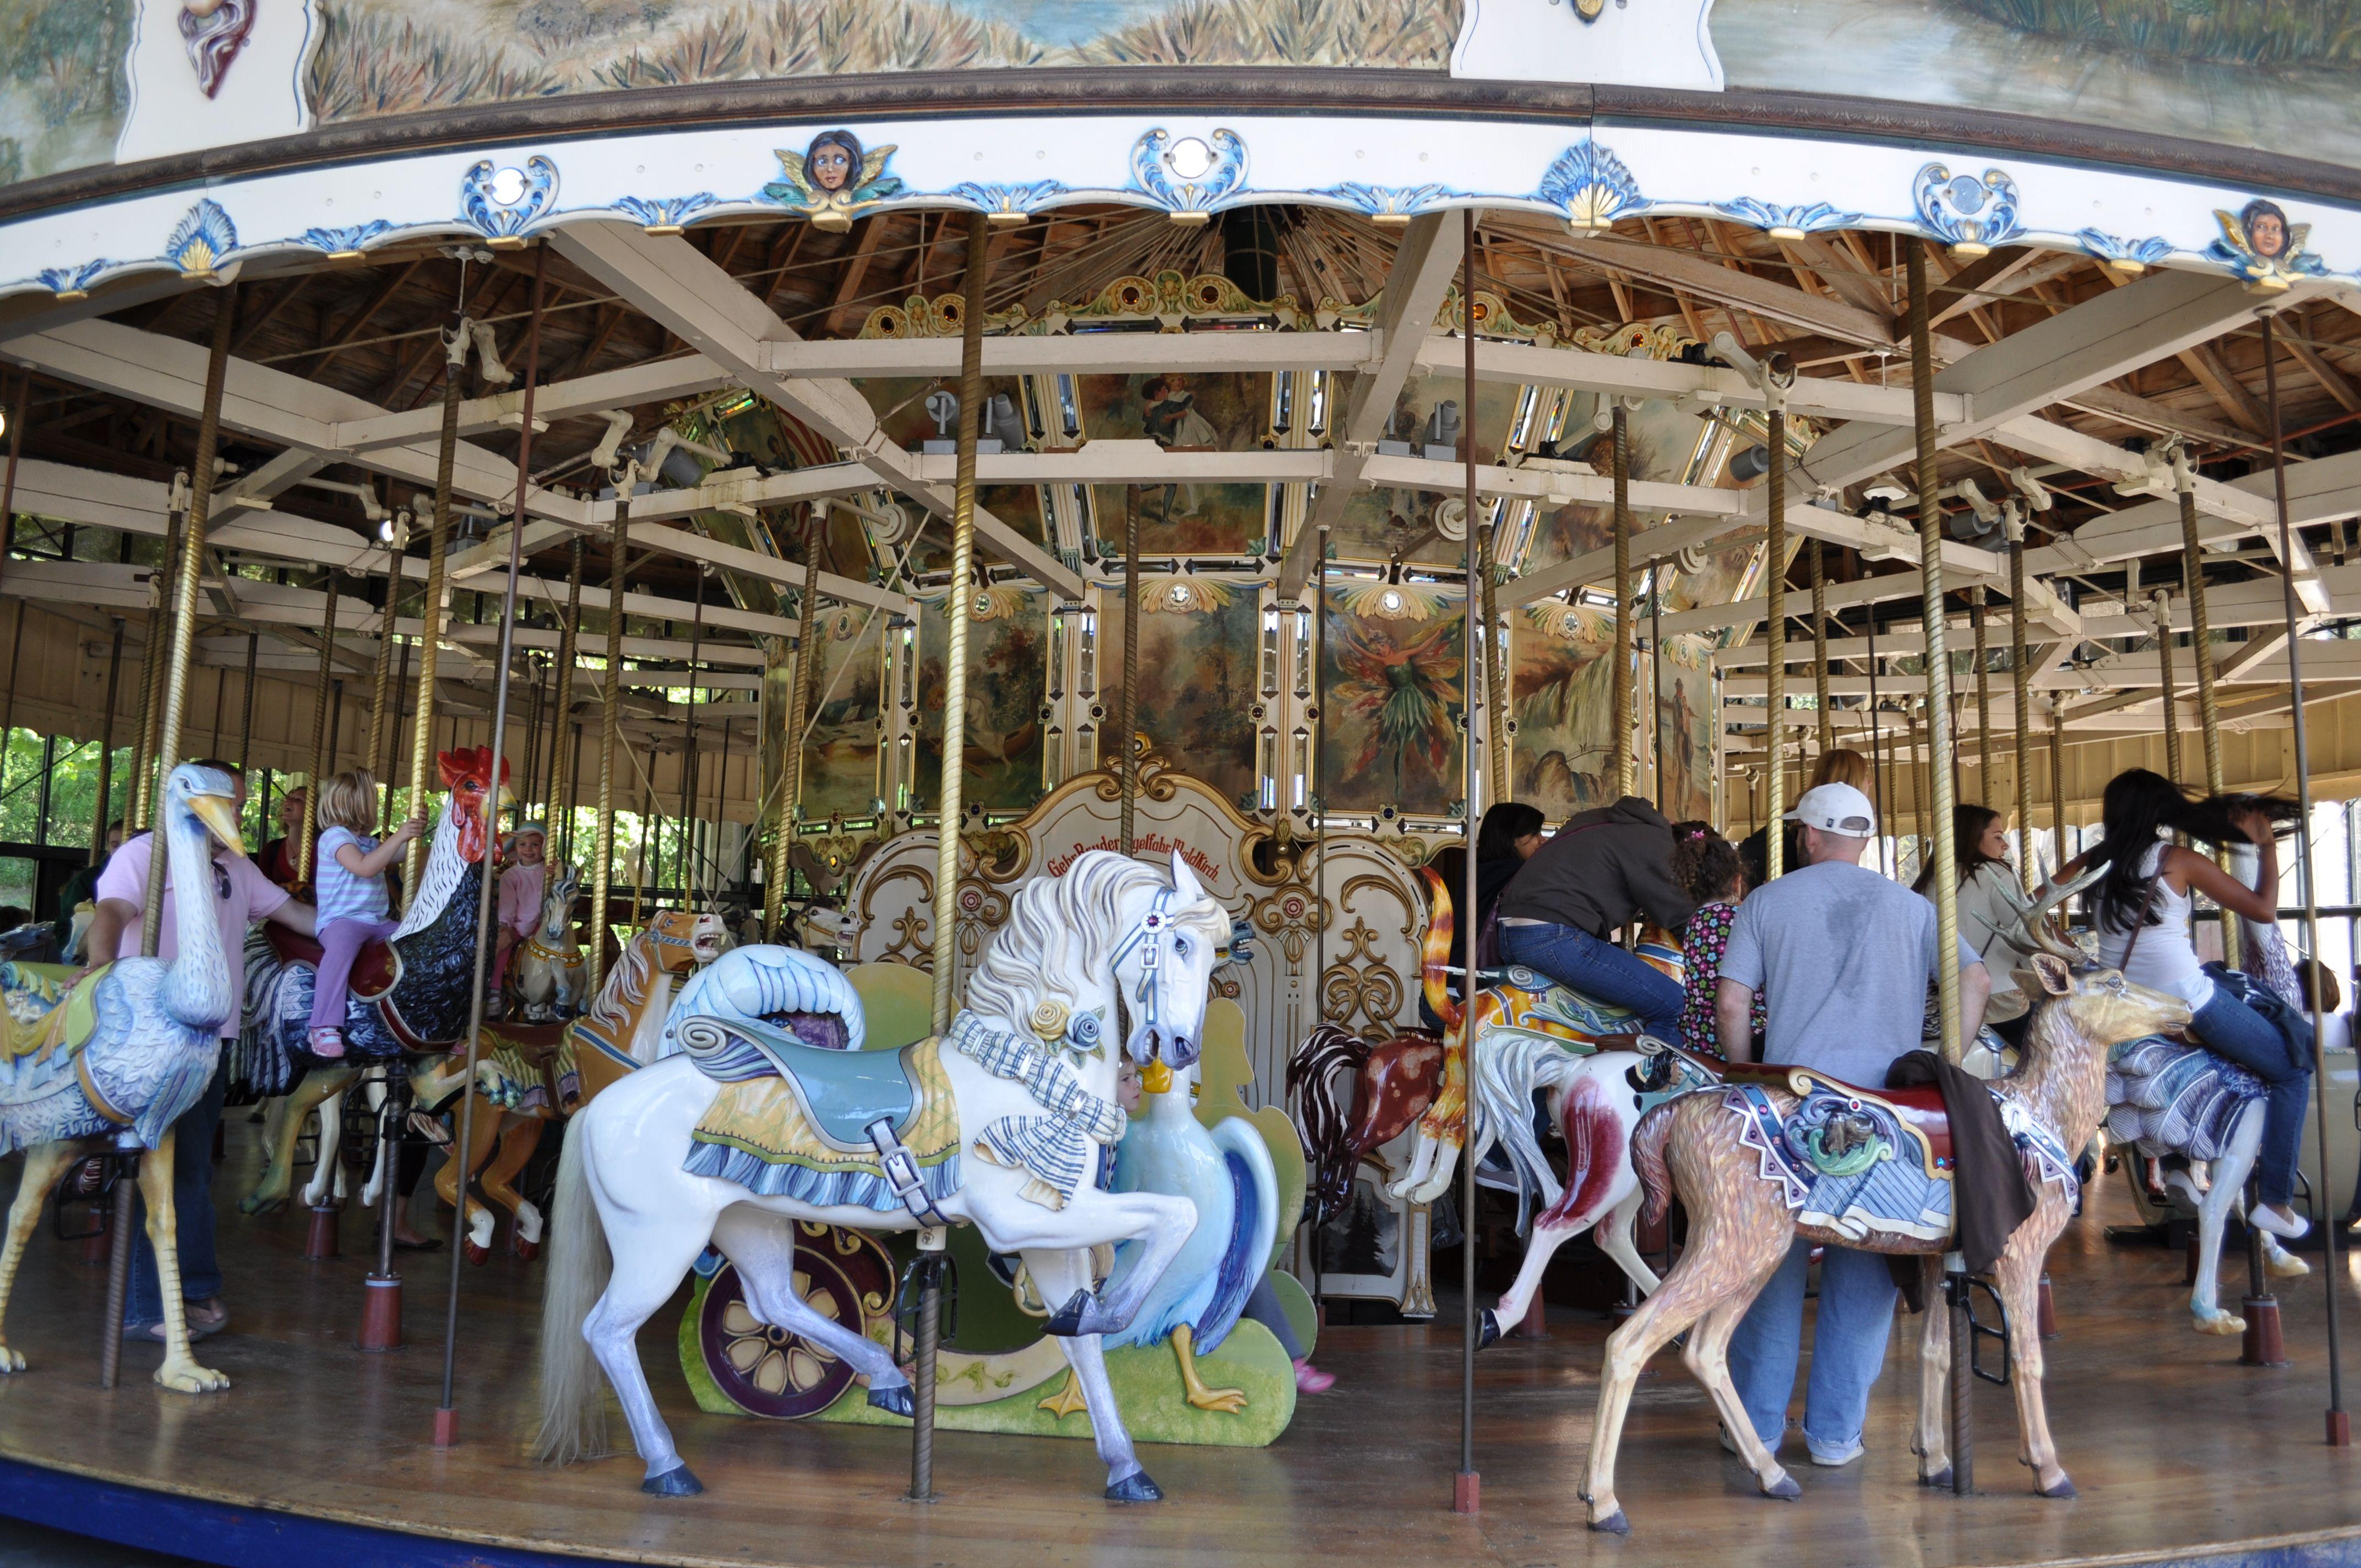 Carousel at Golden Gate Park in San